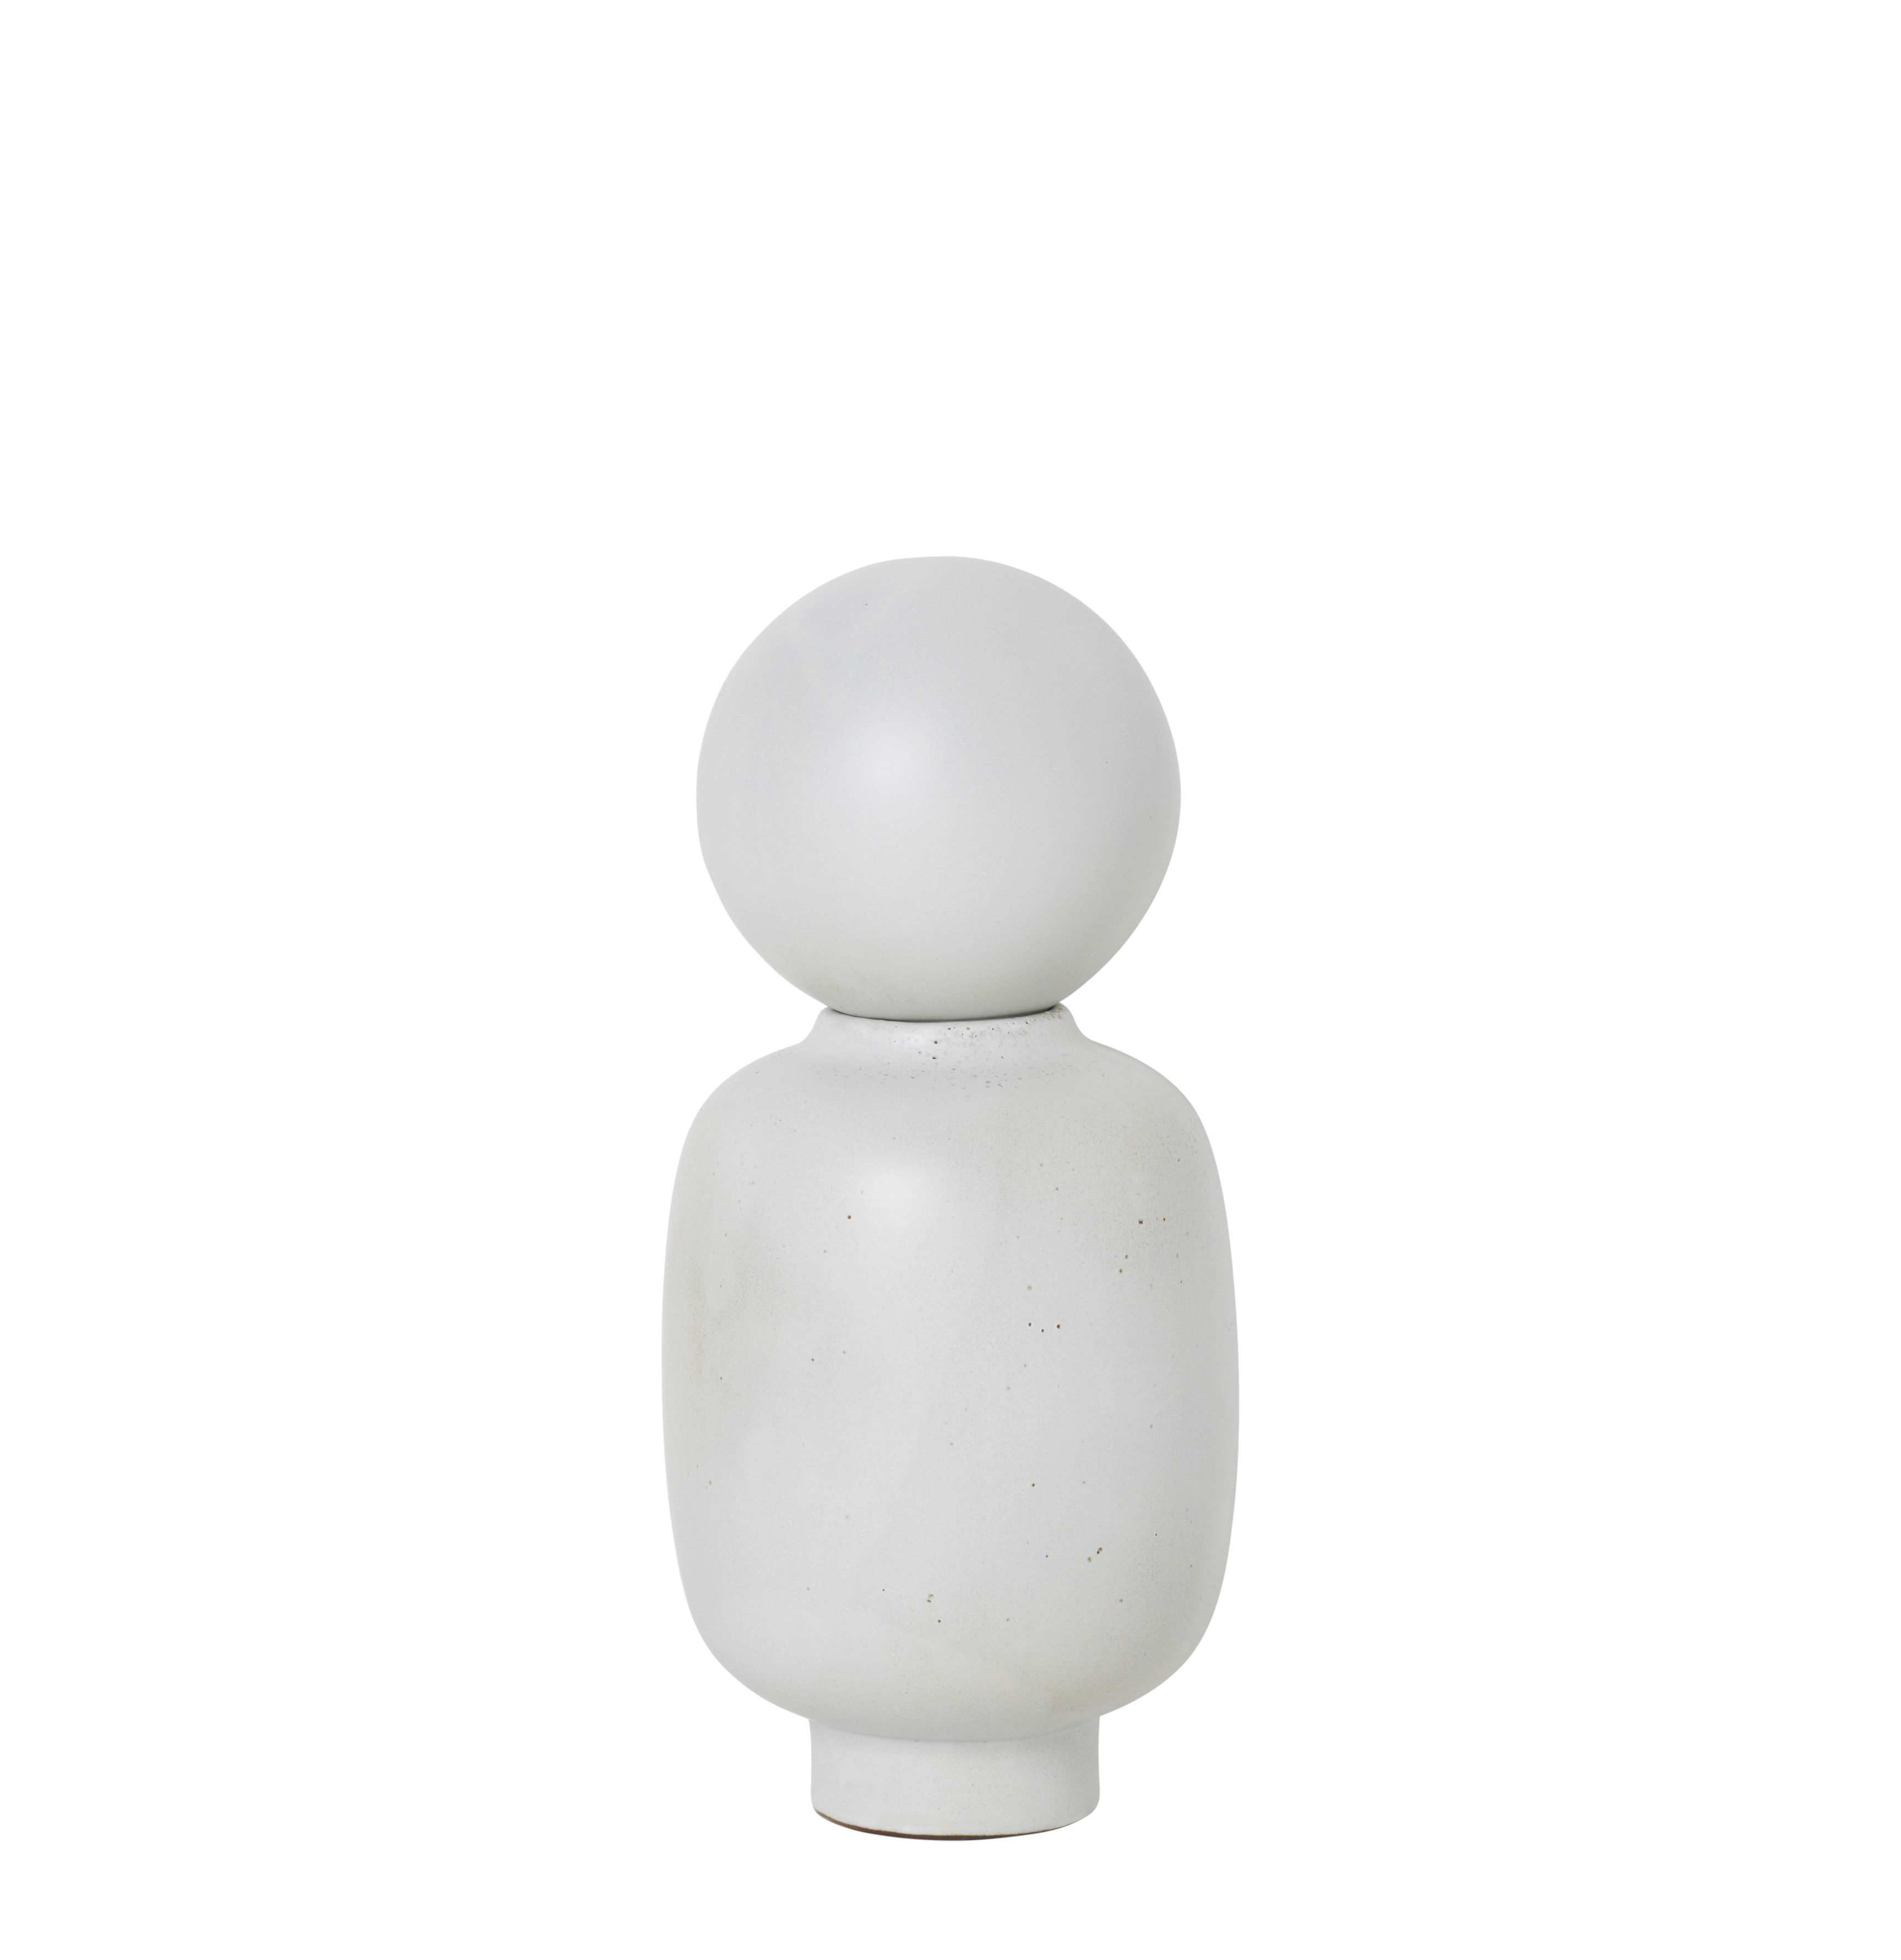 Decoration - Vases - Muses - Talia Vase - / Ø 13 x H 28 cm by Ferm Living - Talia / White - Enamelled sandstone